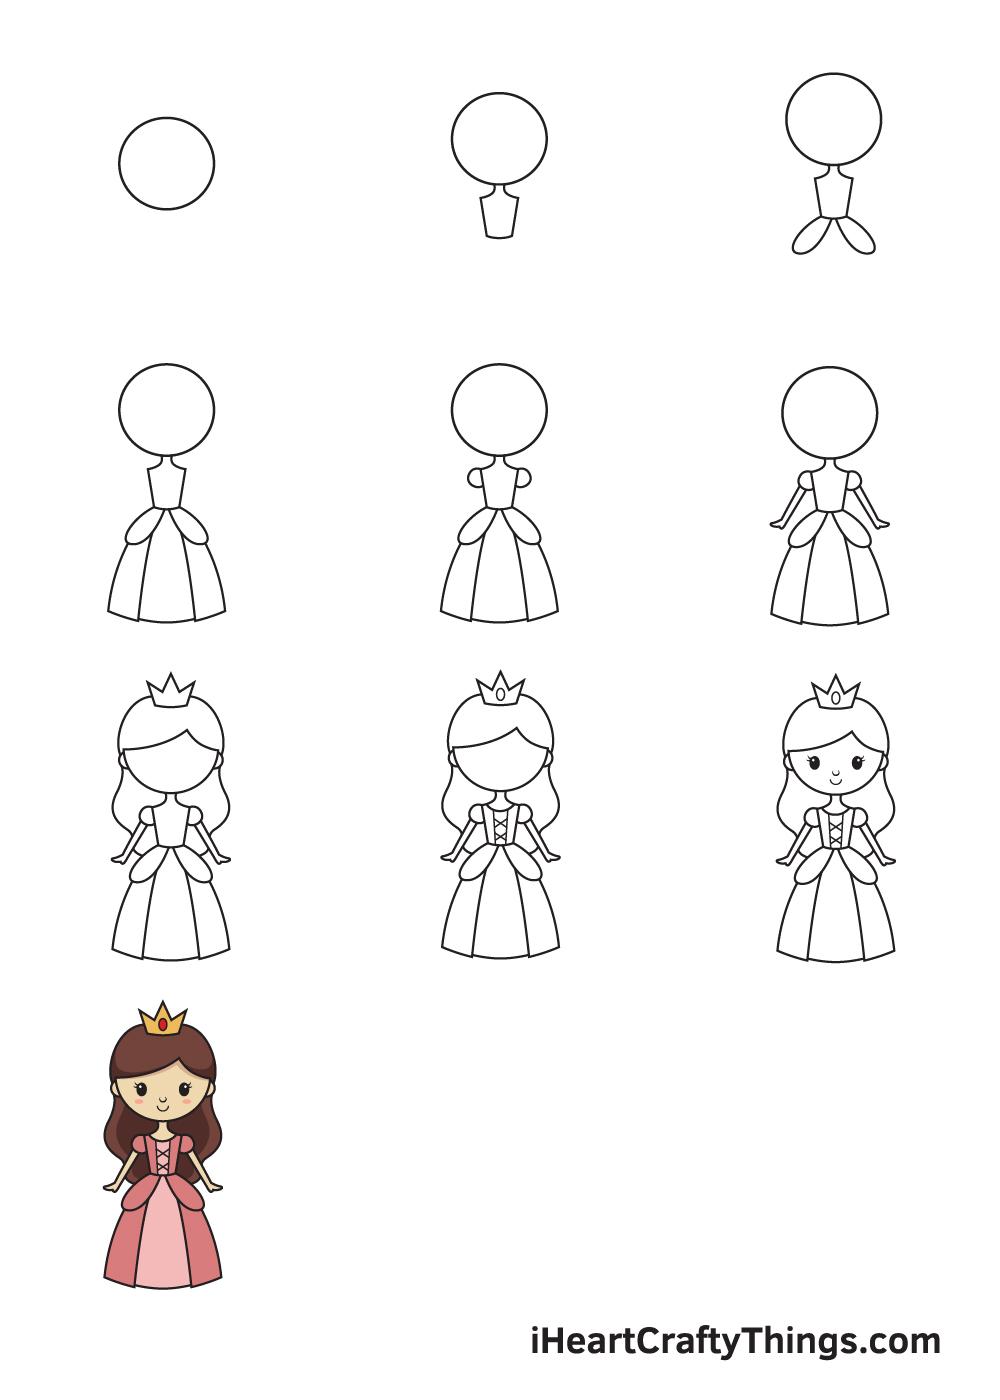 Drawing Princess in 9 Easy Steps